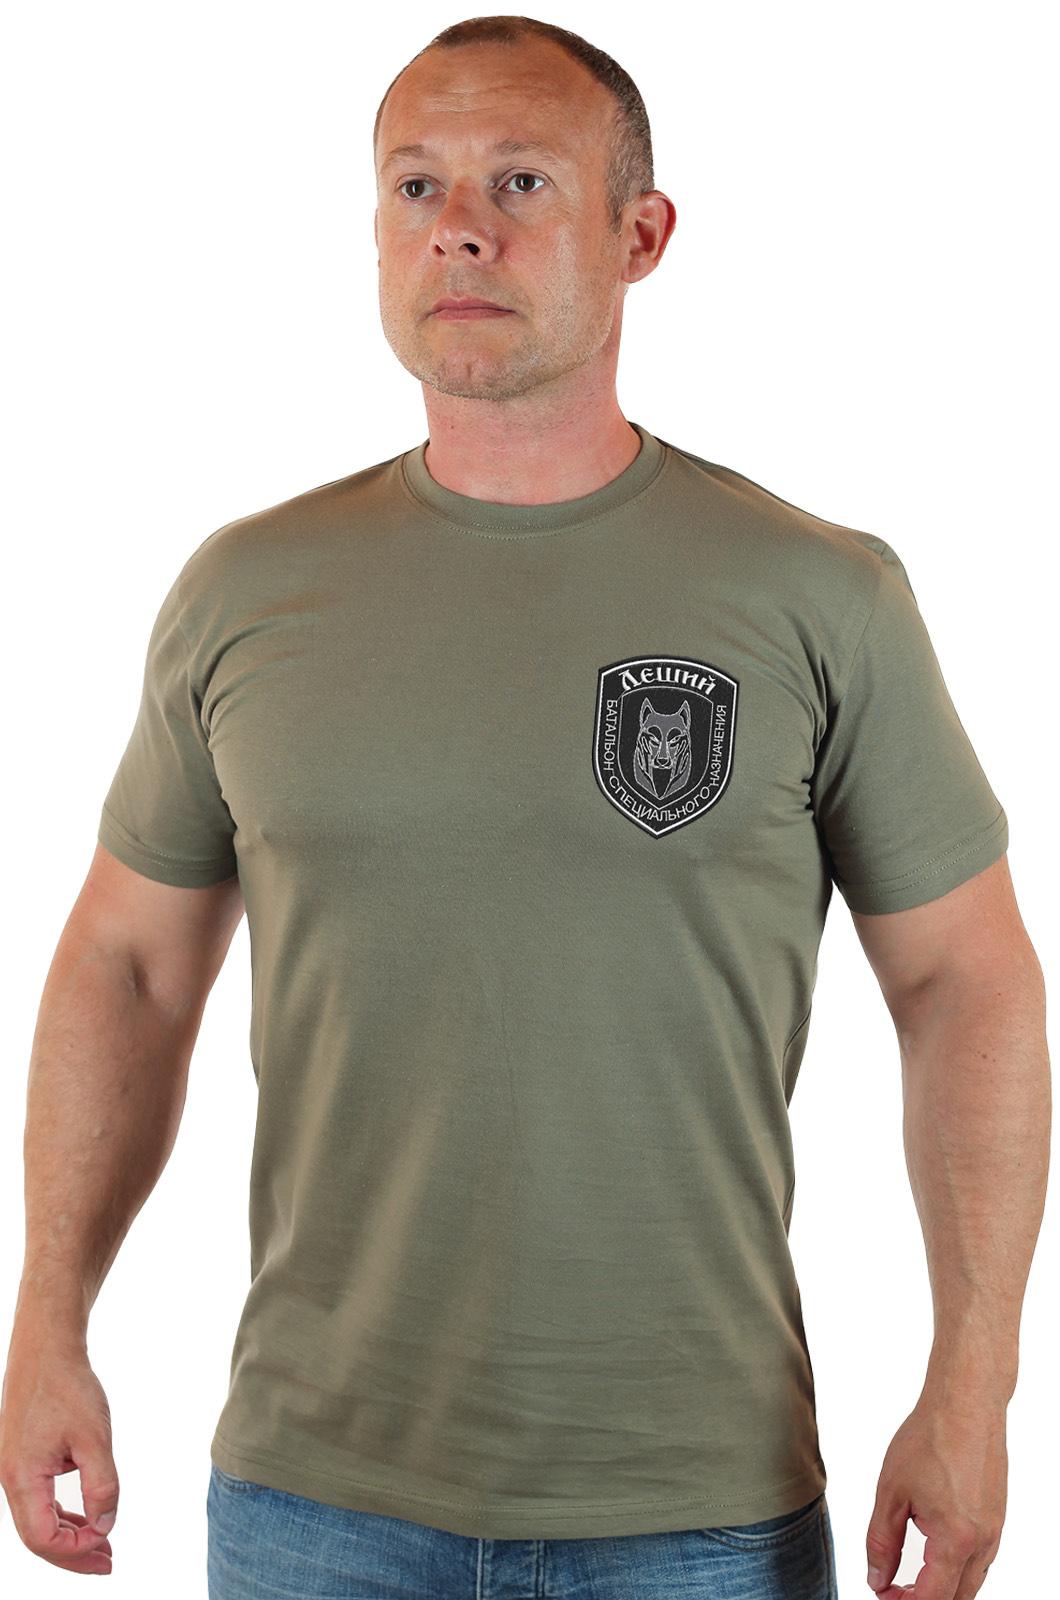 Купить в Военпро футболку ЛНР – Леший